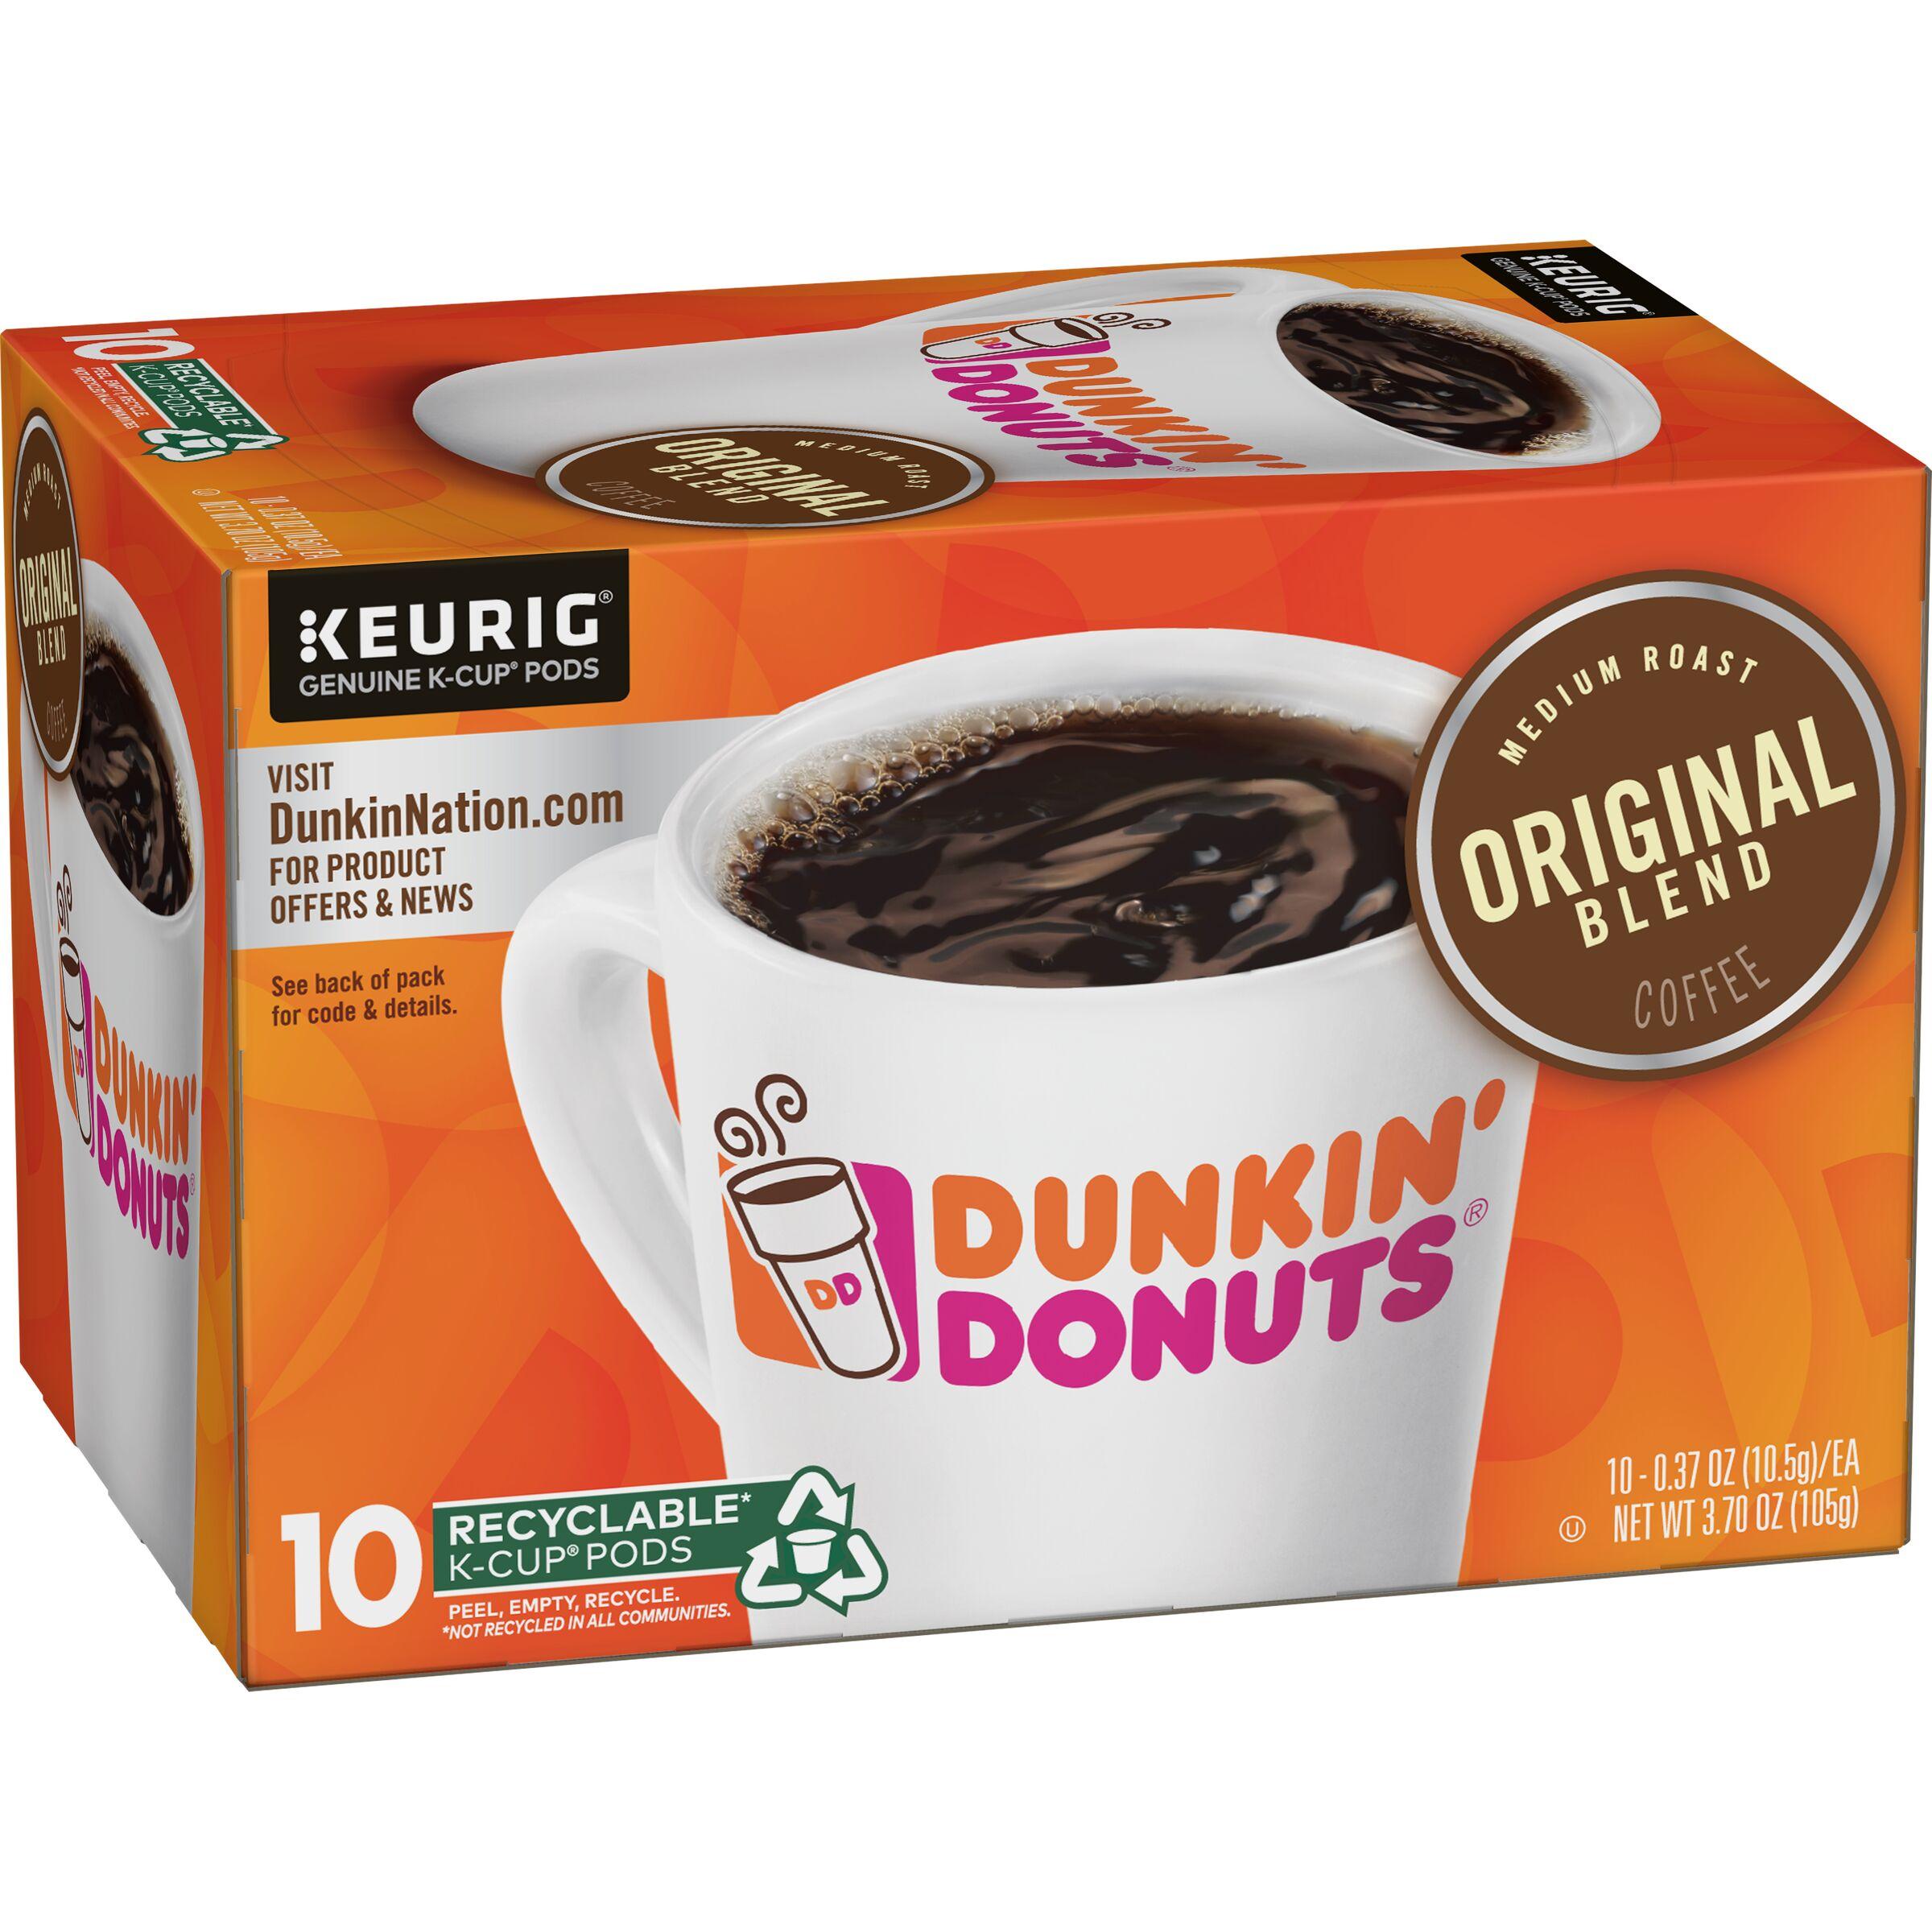 Dunkin' Donuts  Original Blend K-Cup Pods, 10 Count